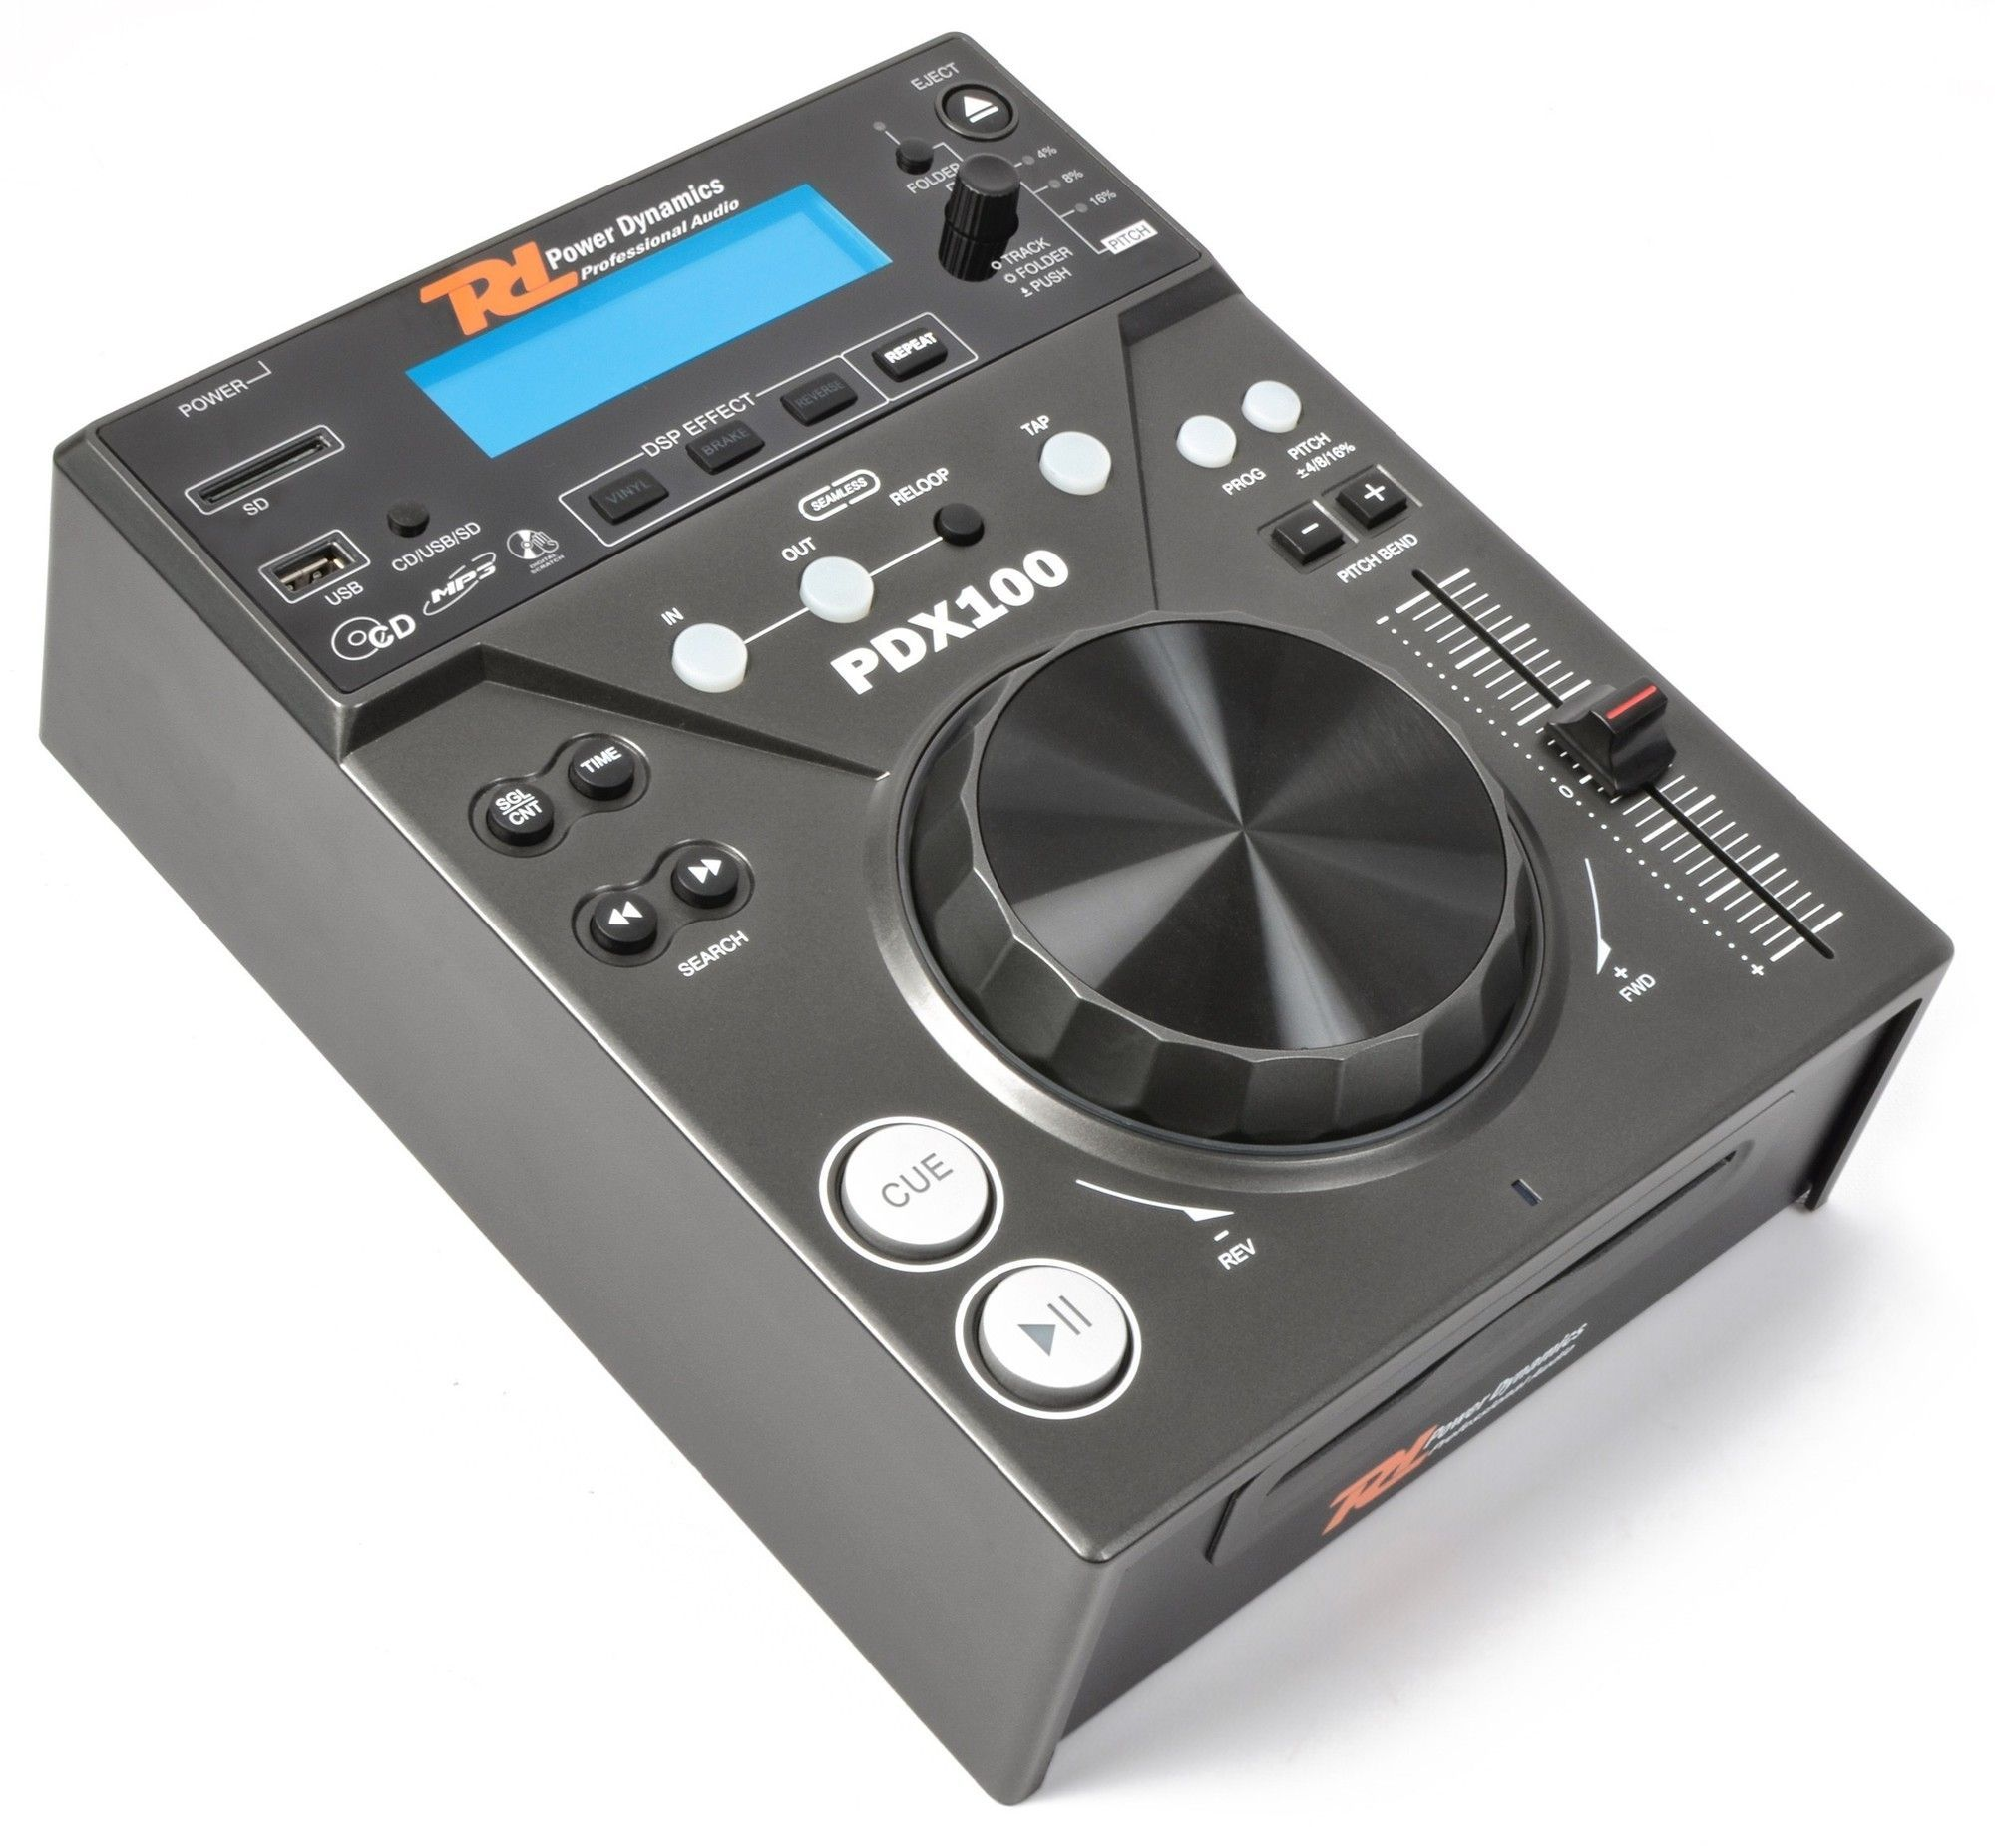 Power Dynamics PDX100 Single Top CD/USB/SD/MP3 speler